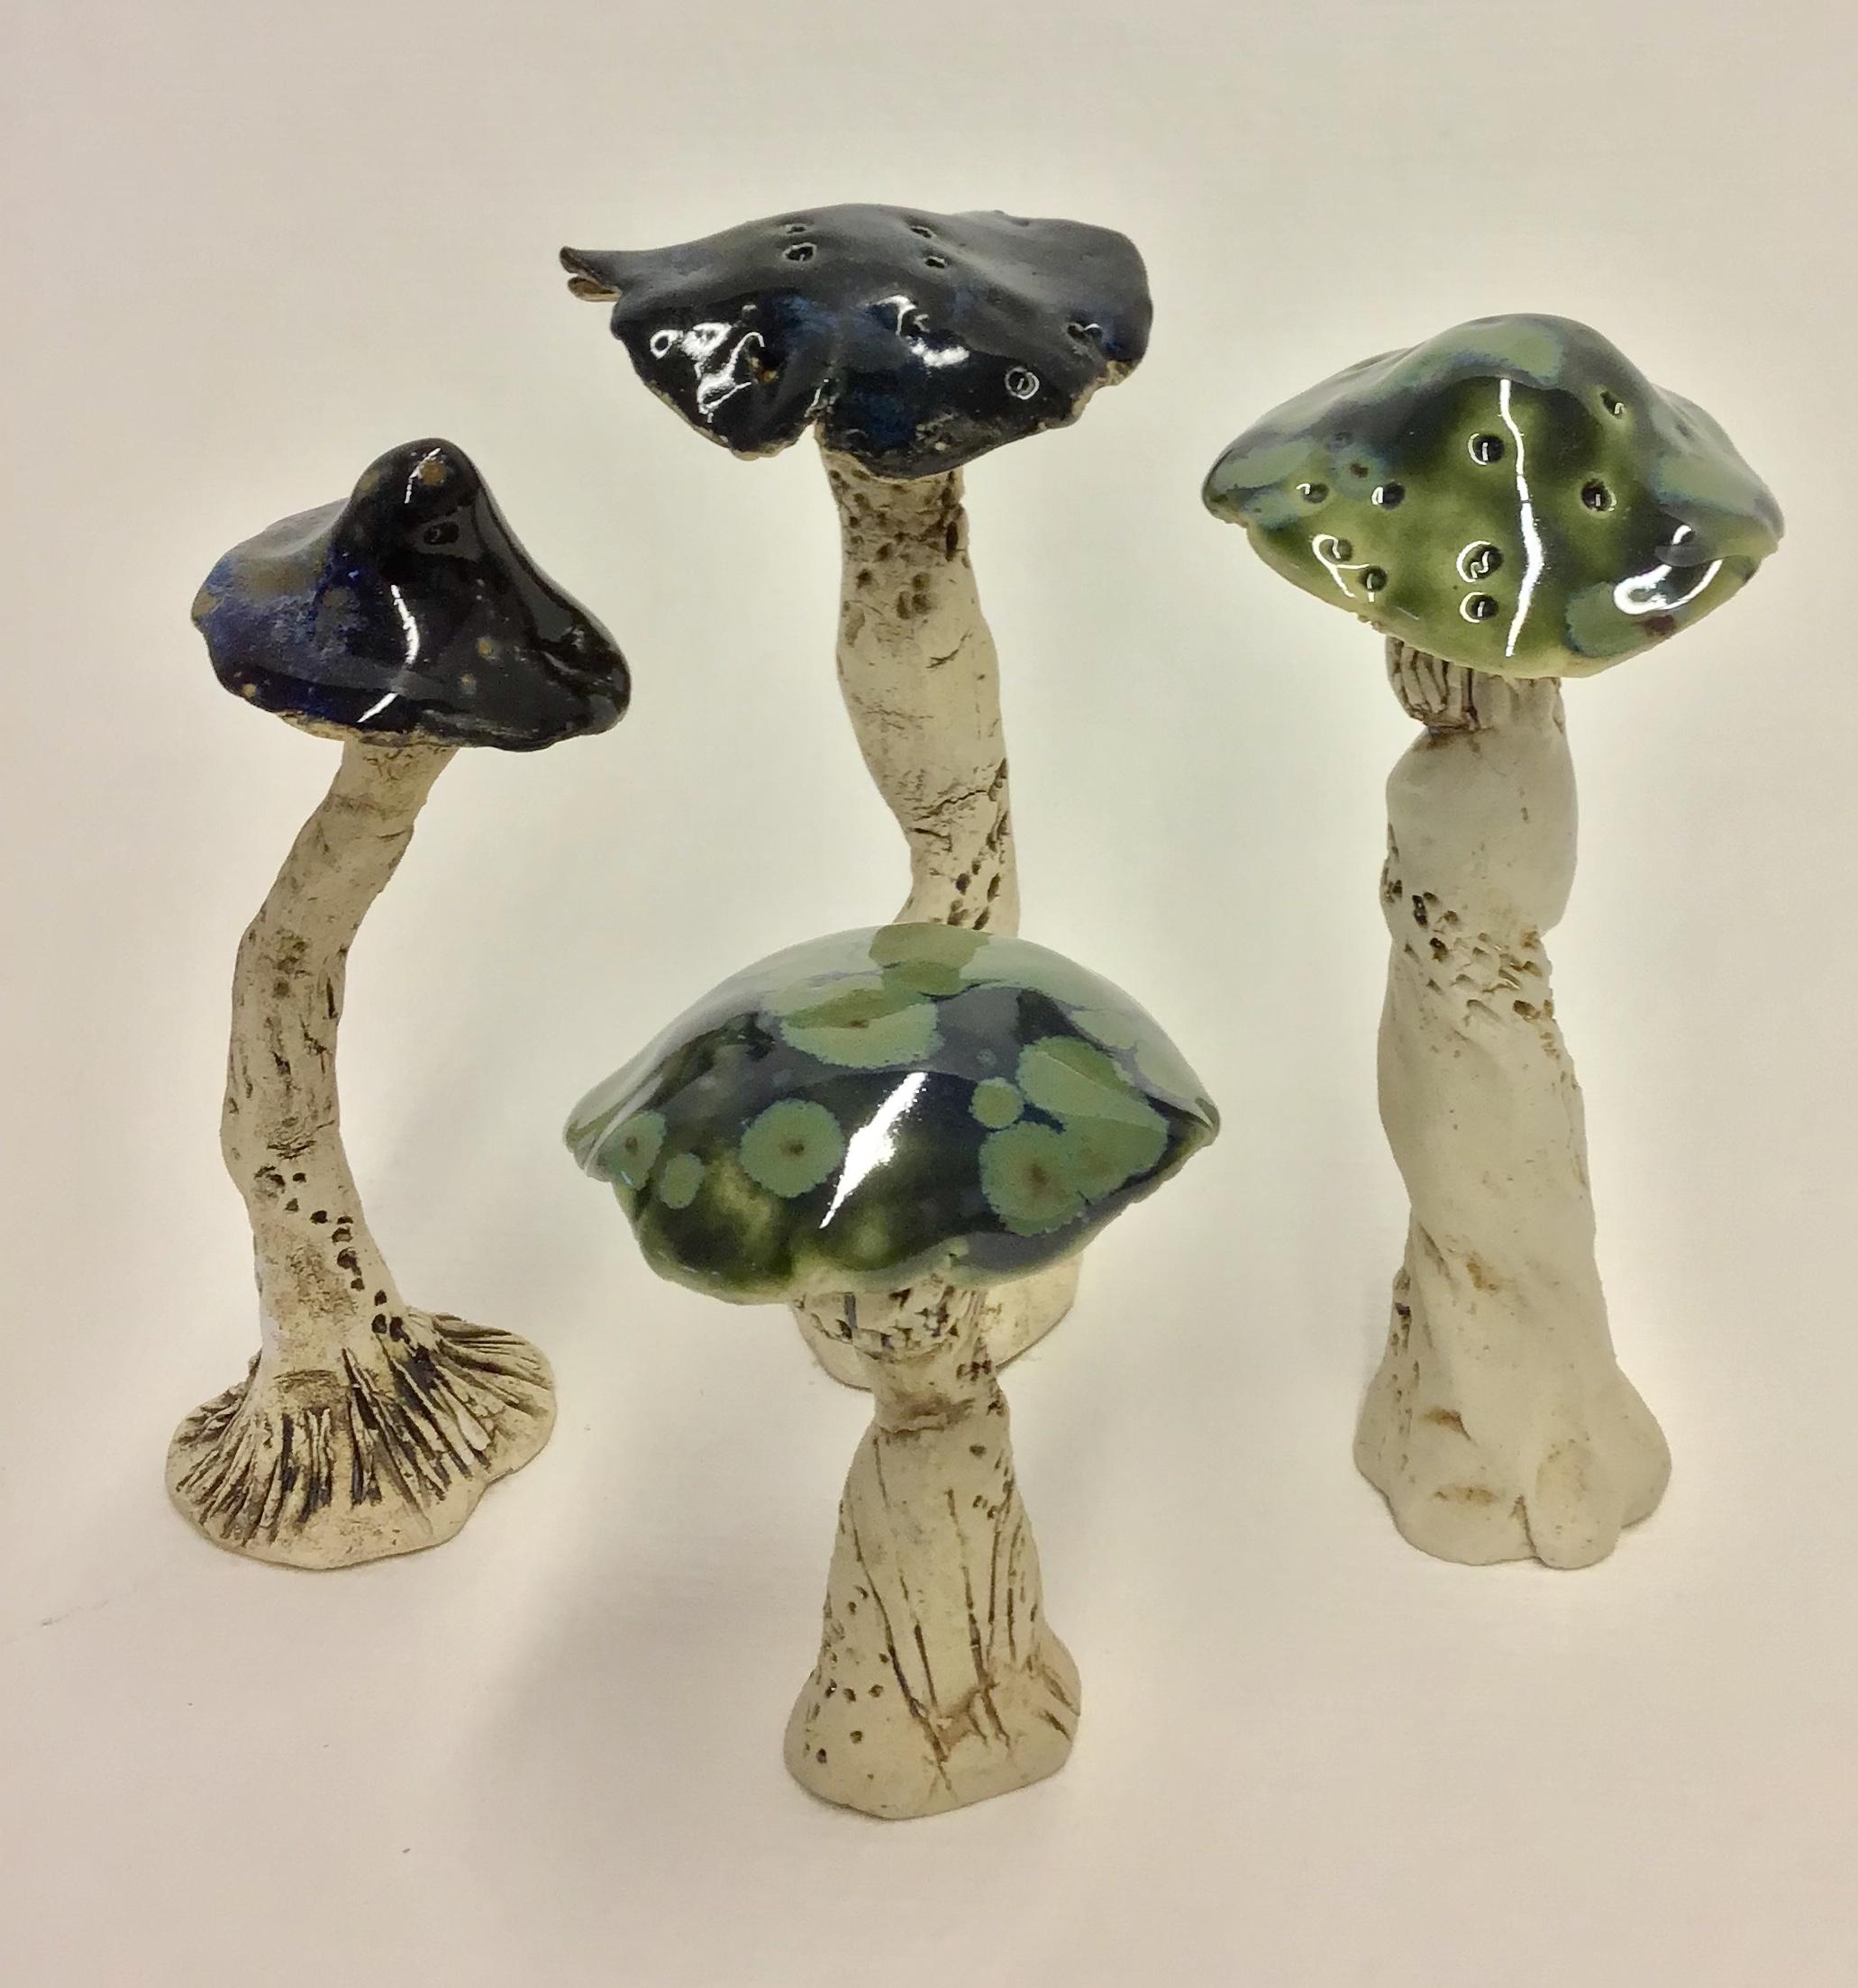 """Mushroom 1""  stoneware, 3x1x5 (2019)   ""Mushroom 2""  stoneware, 2x2x5 (2019)   ""Mushroom 3""  stoneware, 3x3x4 (2019)   ""Mushroom 4""  stoneware, 2x2x5 (2019)"